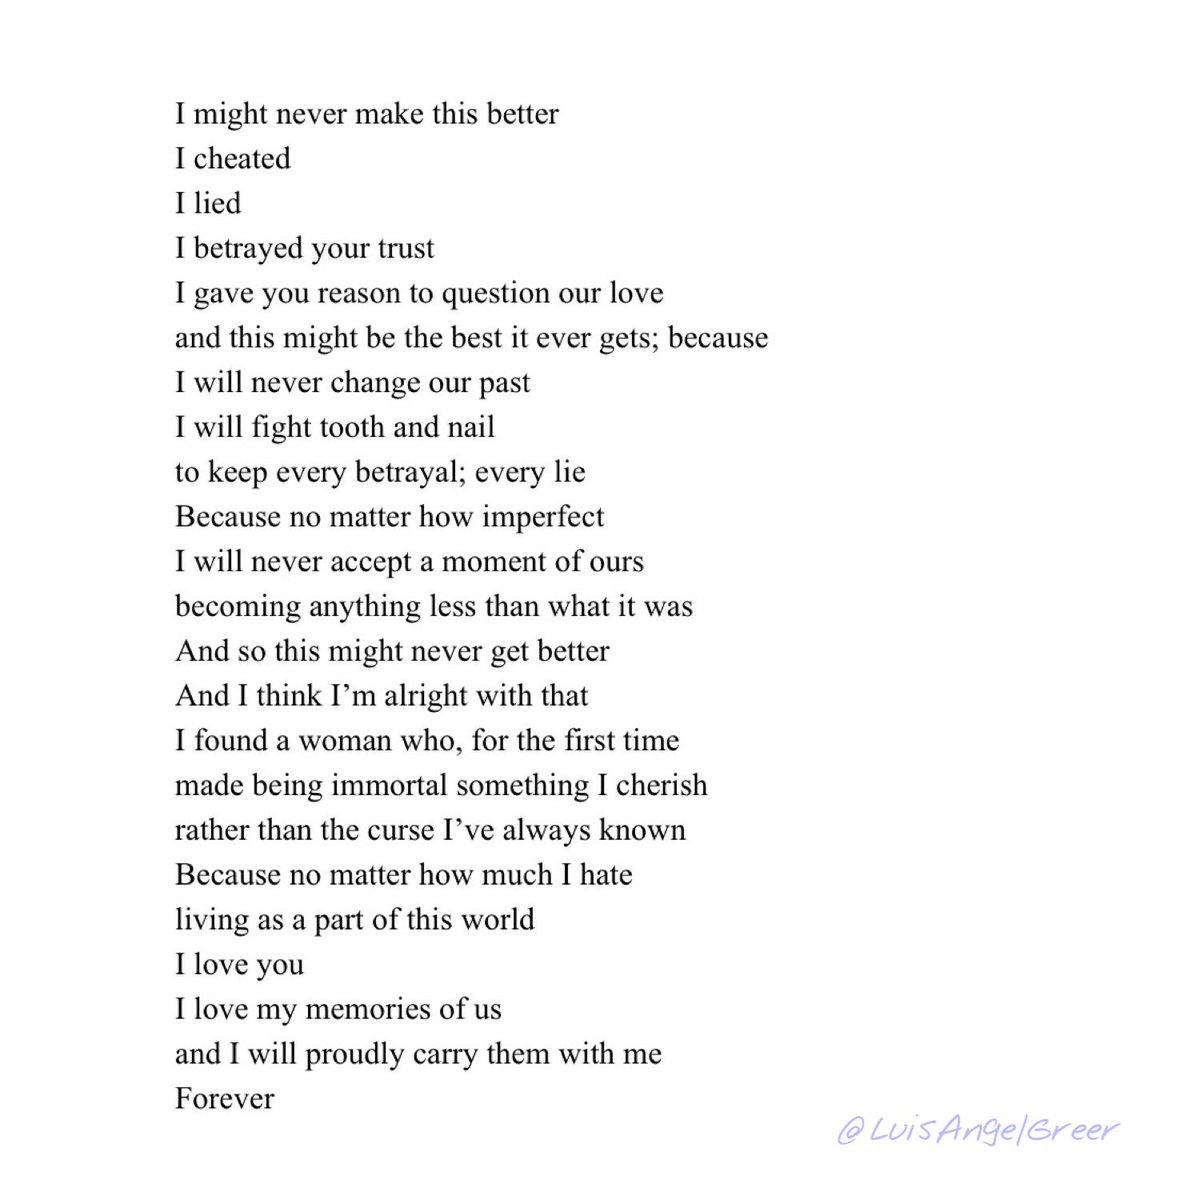 Social Media Collection XI, Piece 92 : Untitled Omen Piece 200222 (1)  #poem #poetry #prose #bleedingedgepoetry #originalpoetry #poetryforthesoul #spilledwords #spilledthoughts #spilledink #darkpoetry #love #lovepoem #lovepoemspic.twitter.com/BI2zsqYVki